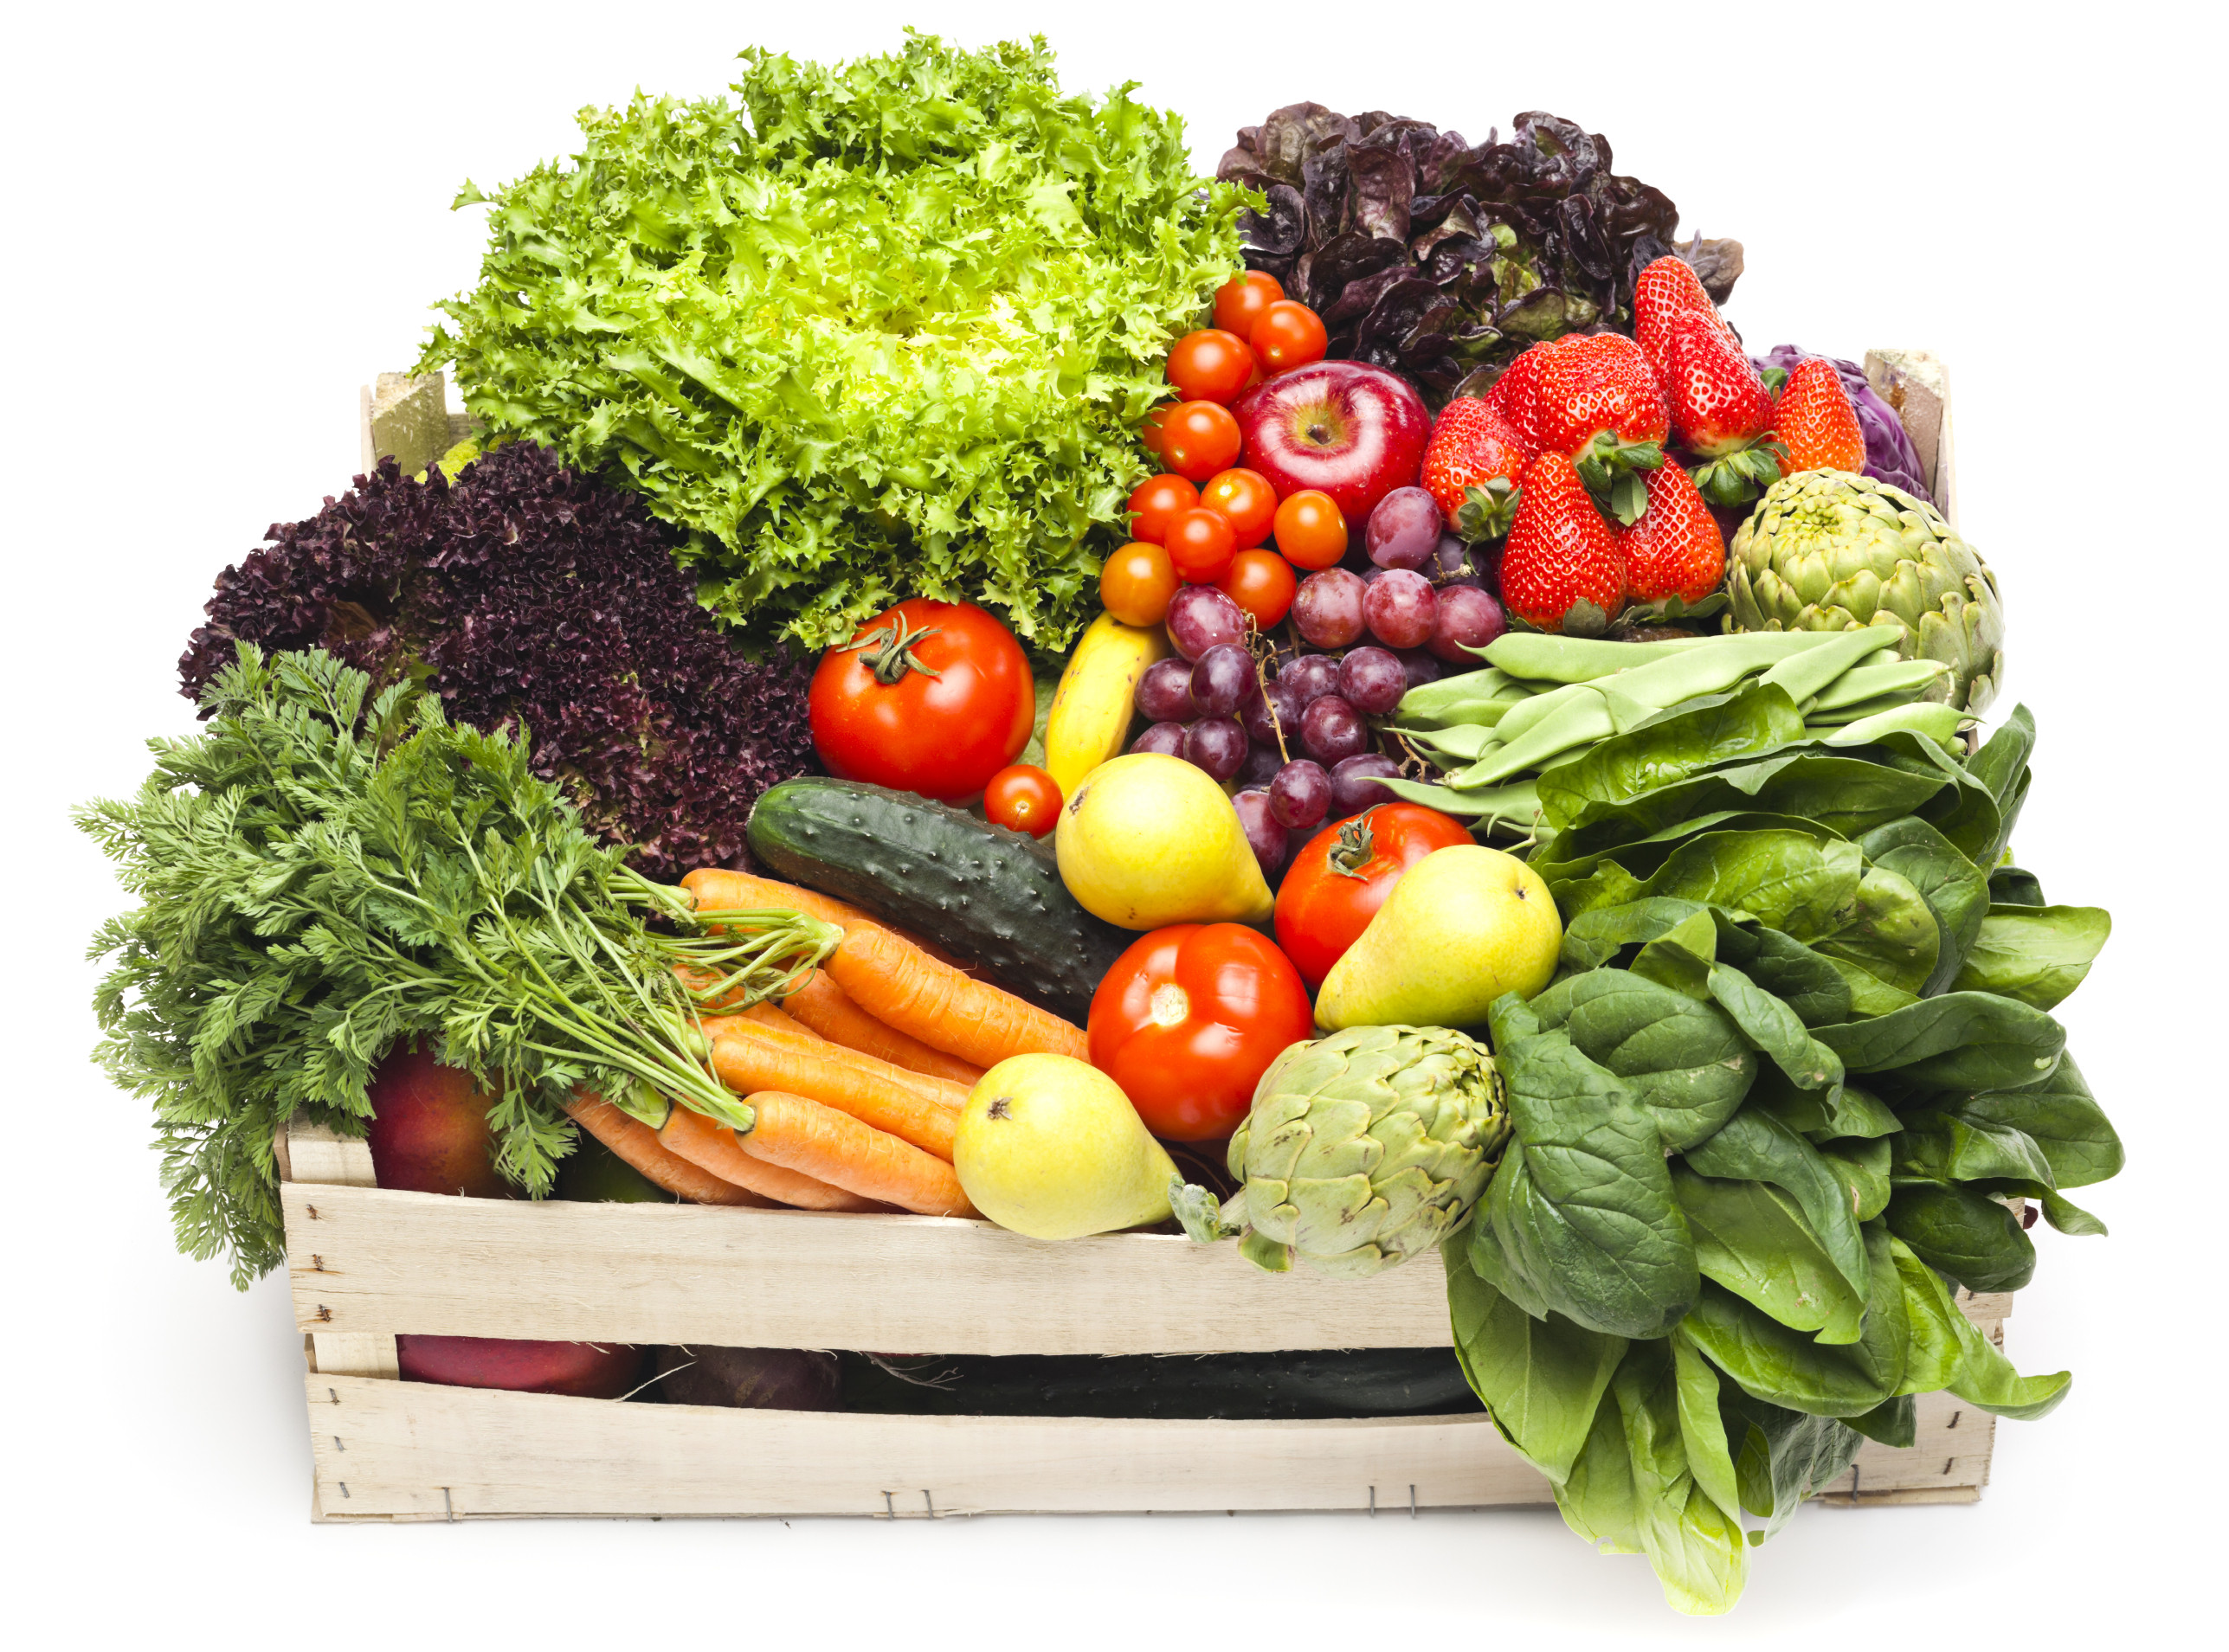 The Raw Vegan Diet for Wellness